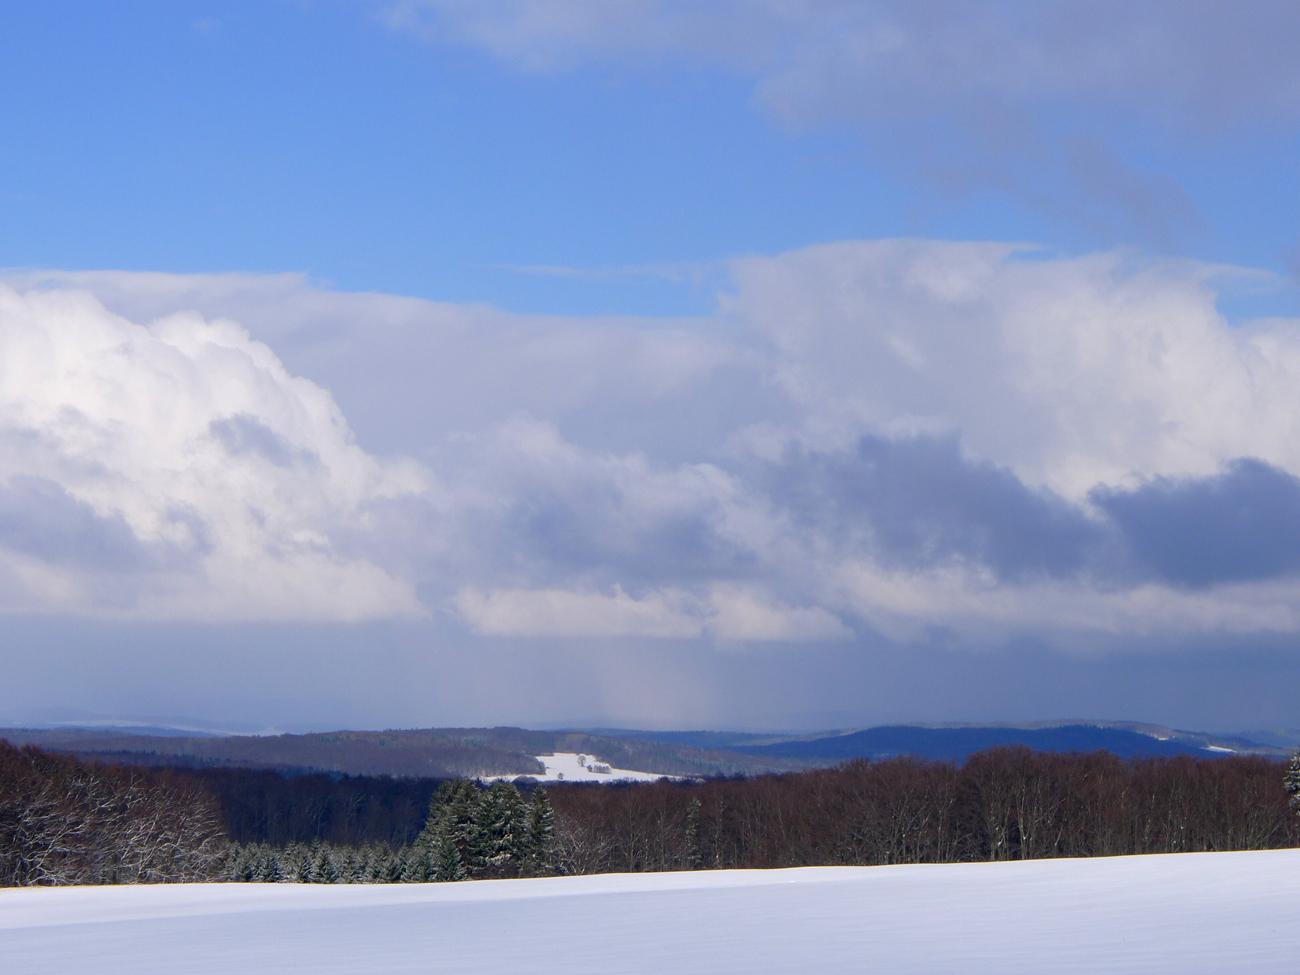 Winterspaziergang 4